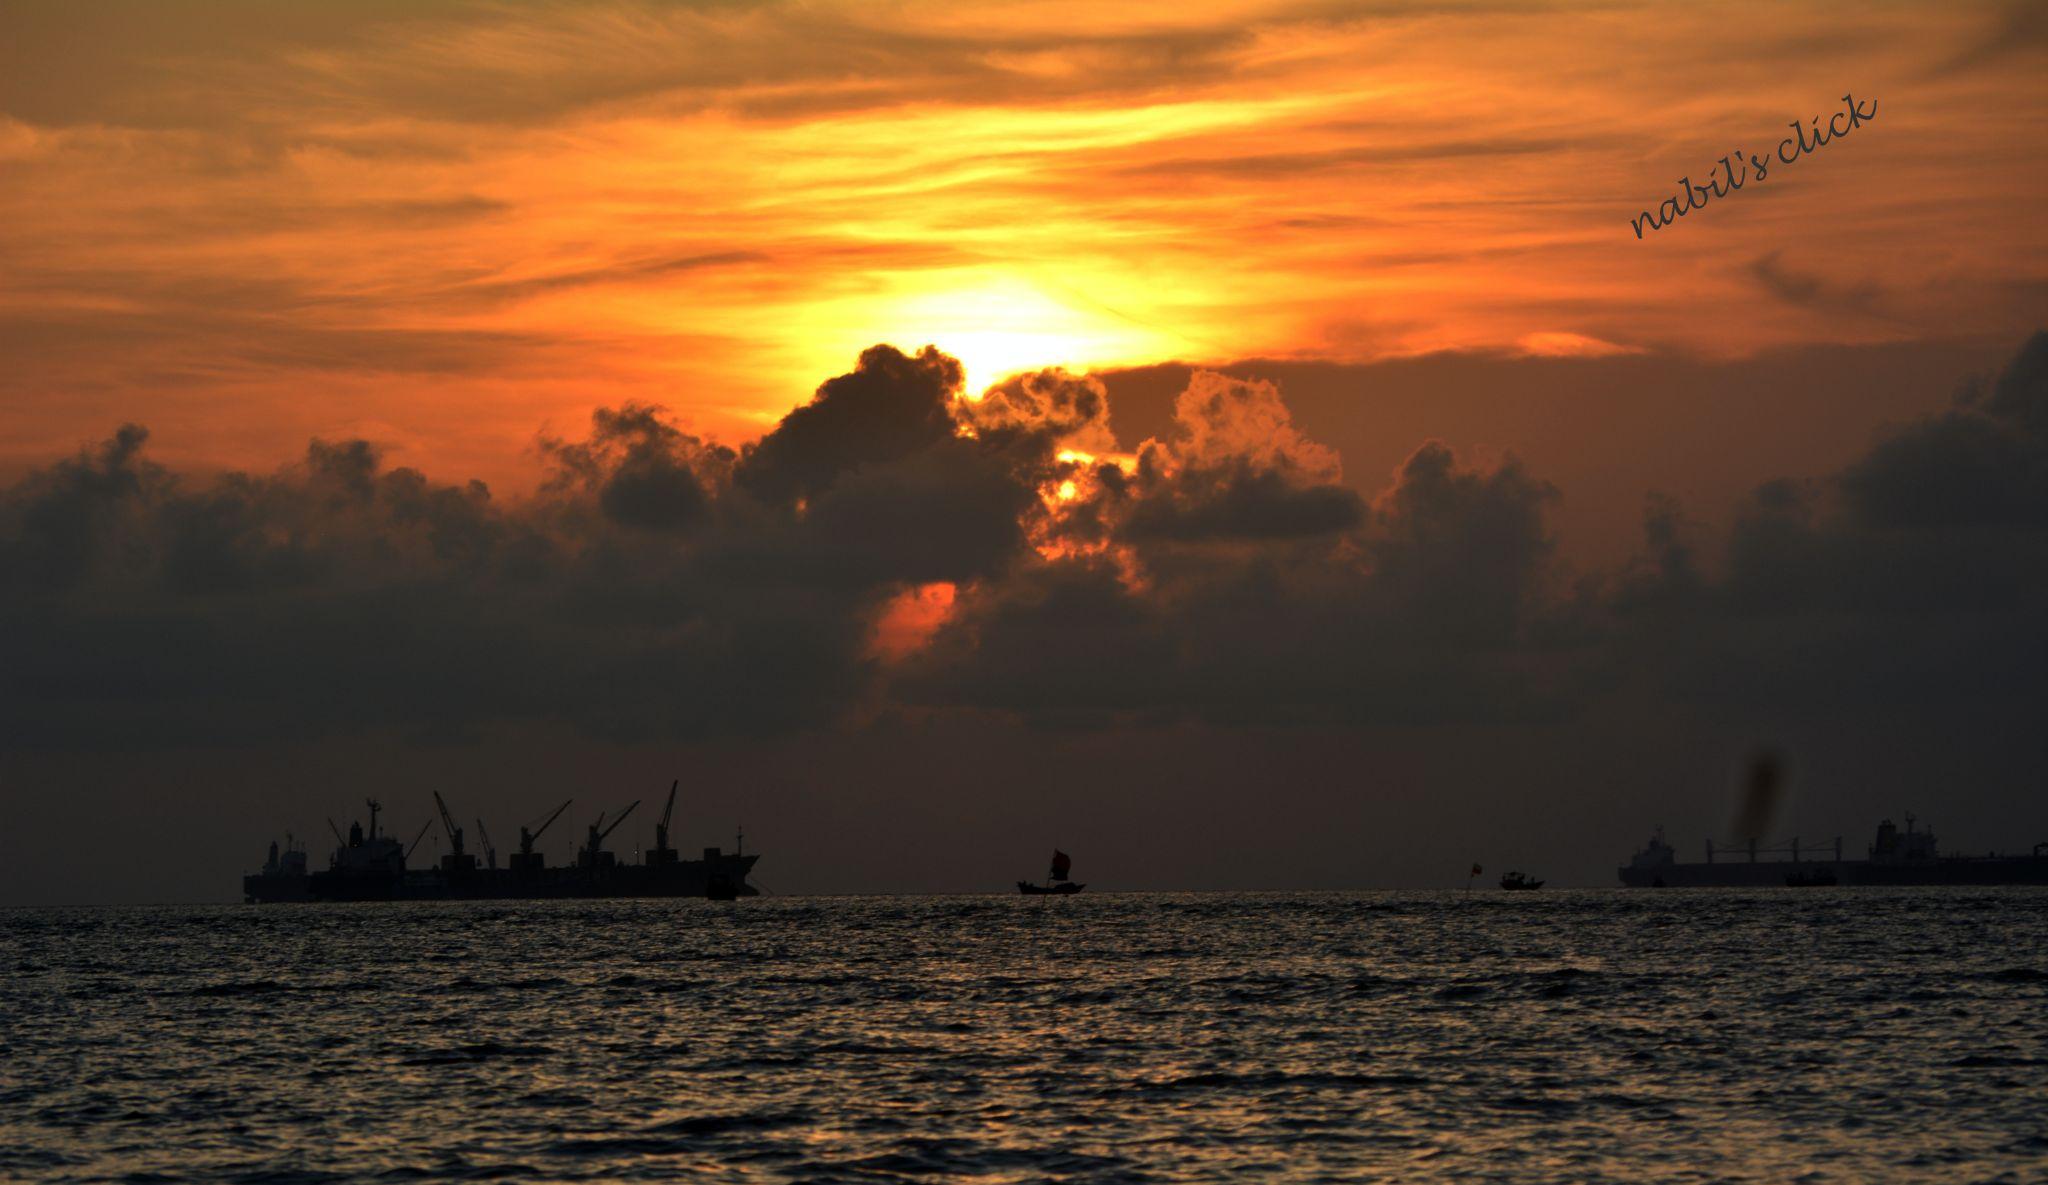 Twilight's last light by Nabil Ahmed